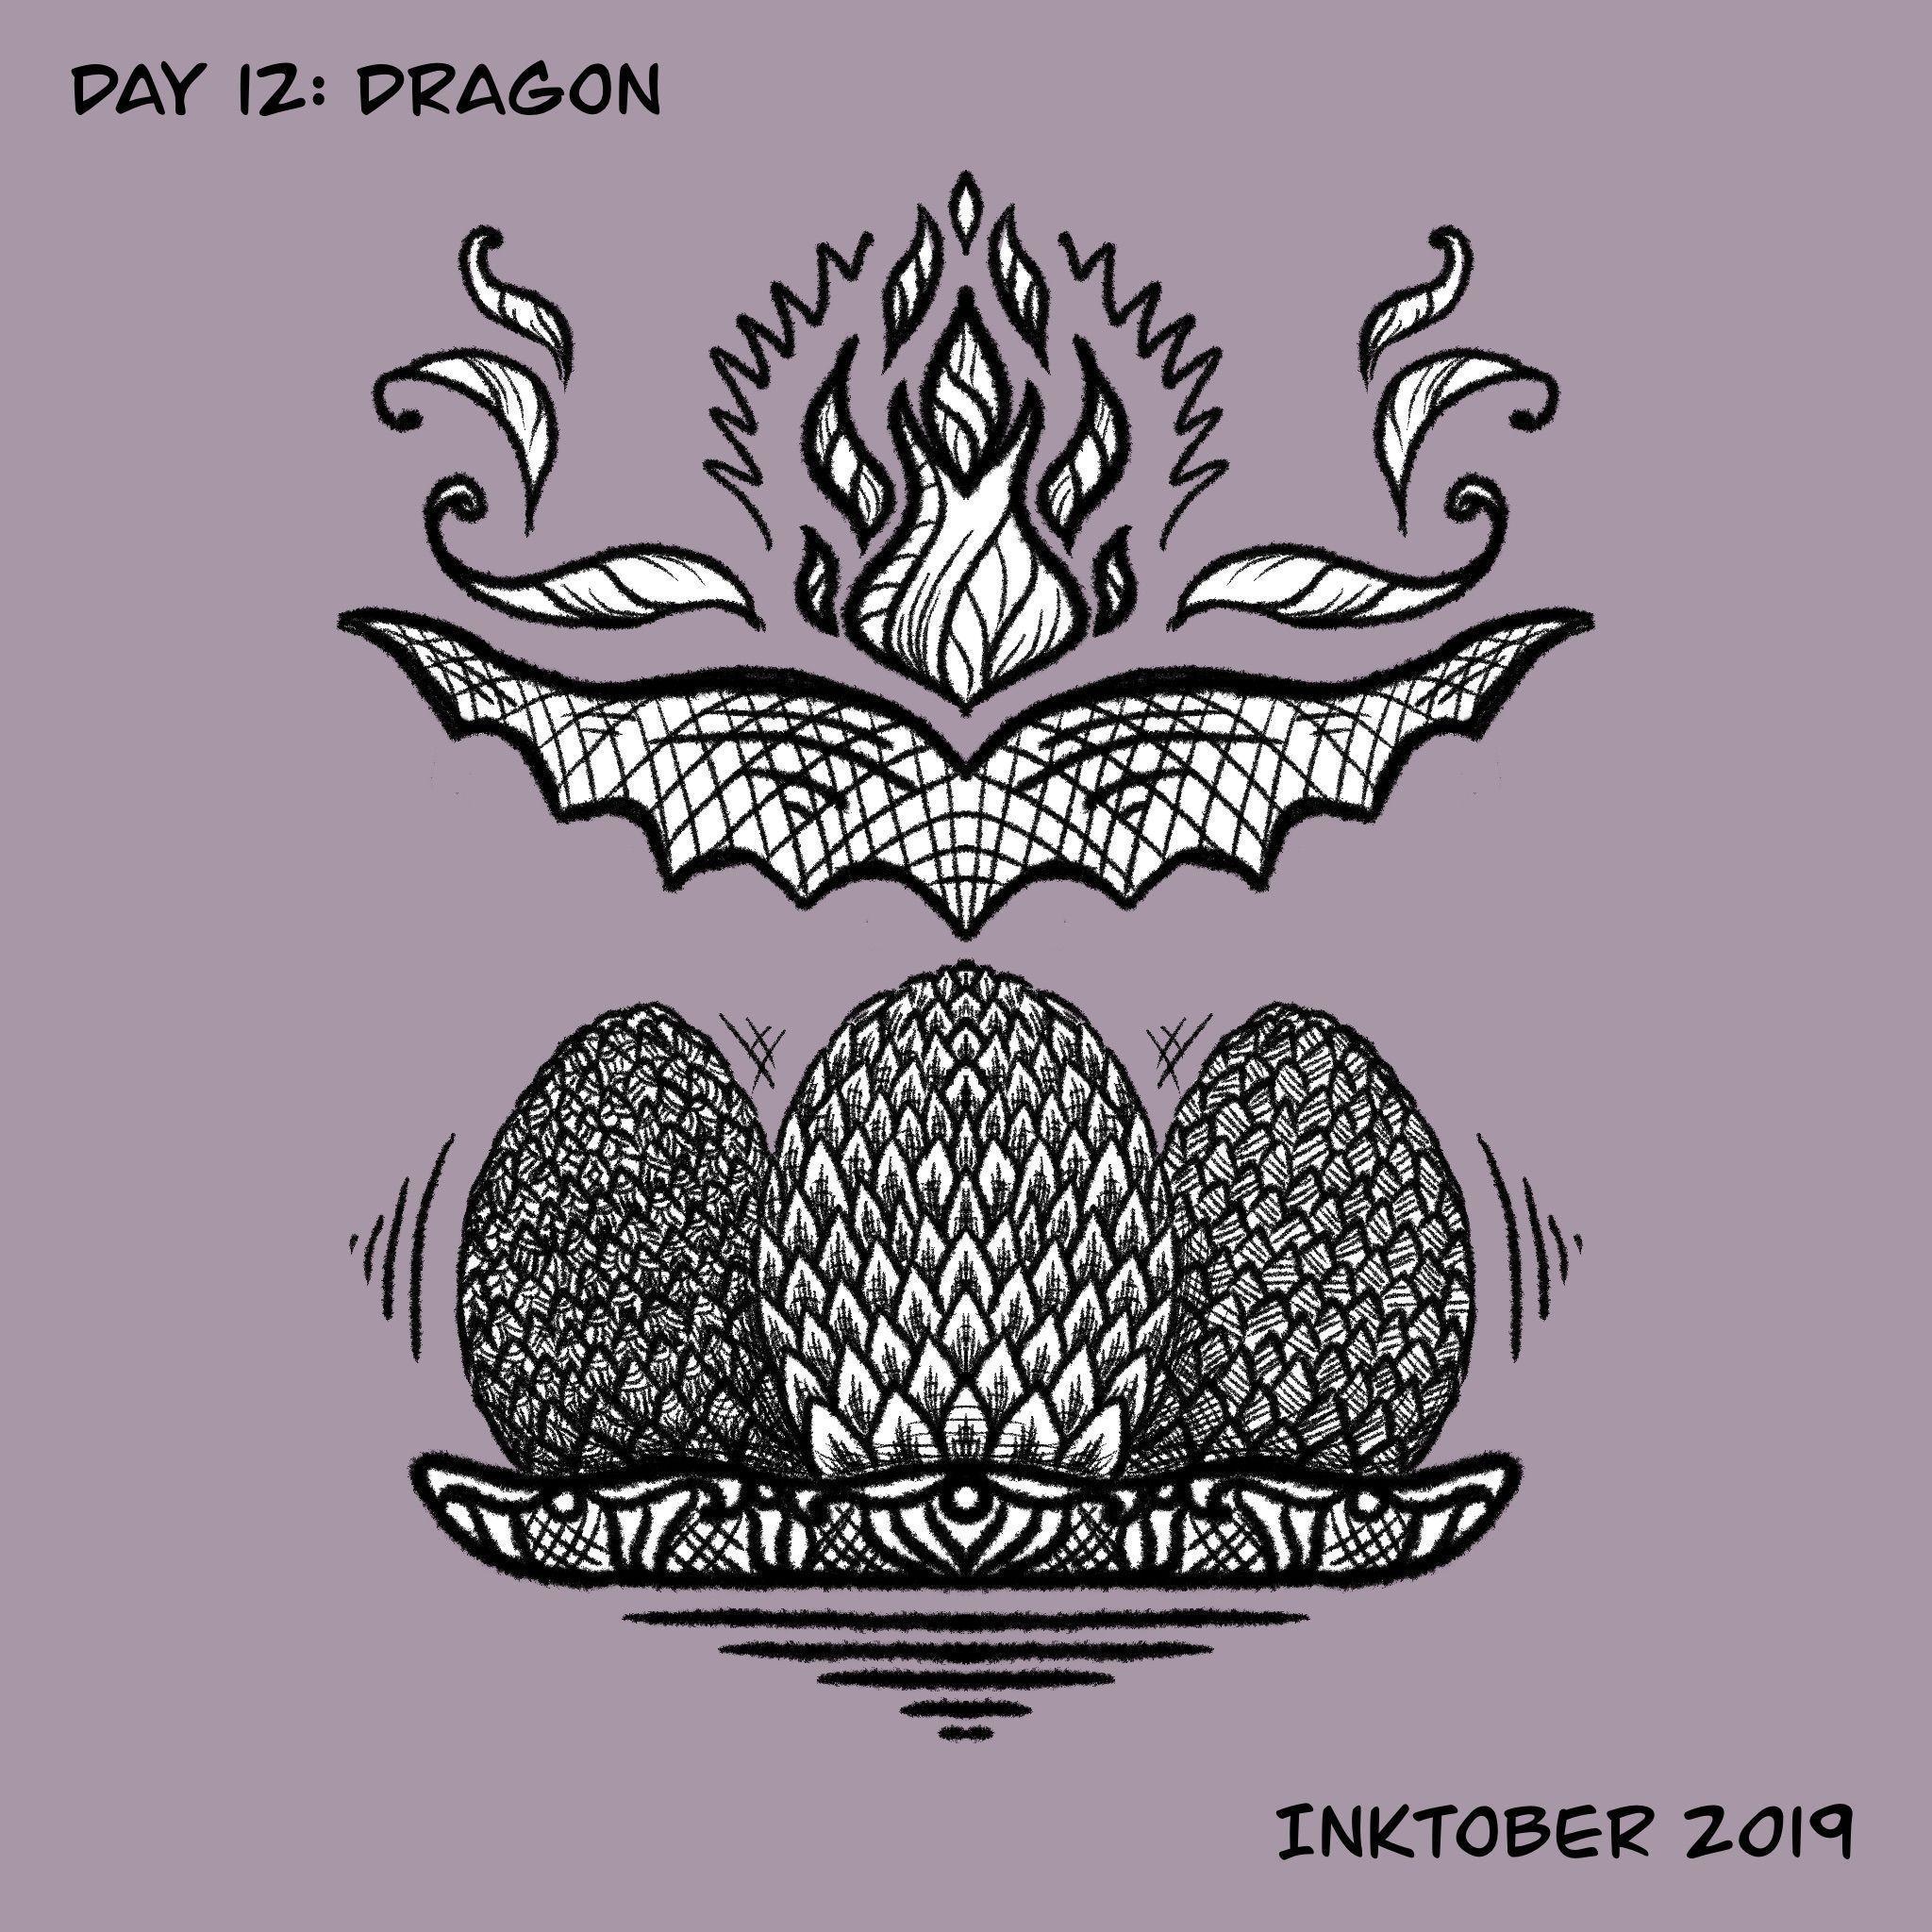 Day 12: dragon #inktober2019 Inktober 2019 #inktober2019 Day 12: dragon #inktober2019 Inktober 2019 #inktober2019 Day 12: dragon #inktober2019 Inktober 2019 #inktober2019 Day 12: dragon #inktober2019 Inktober 2019 #inktober2019 Day 12: dragon #inktober2019 Inktober 2019 #inktober2019 Day 12: dragon #inktober2019 Inktober 2019 #inktober2019 Day 12: dragon #inktober2019 Inktober 2019 #inktober2019 Day 12: dragon #inktober2019 Inktober 2019 #inktober2019